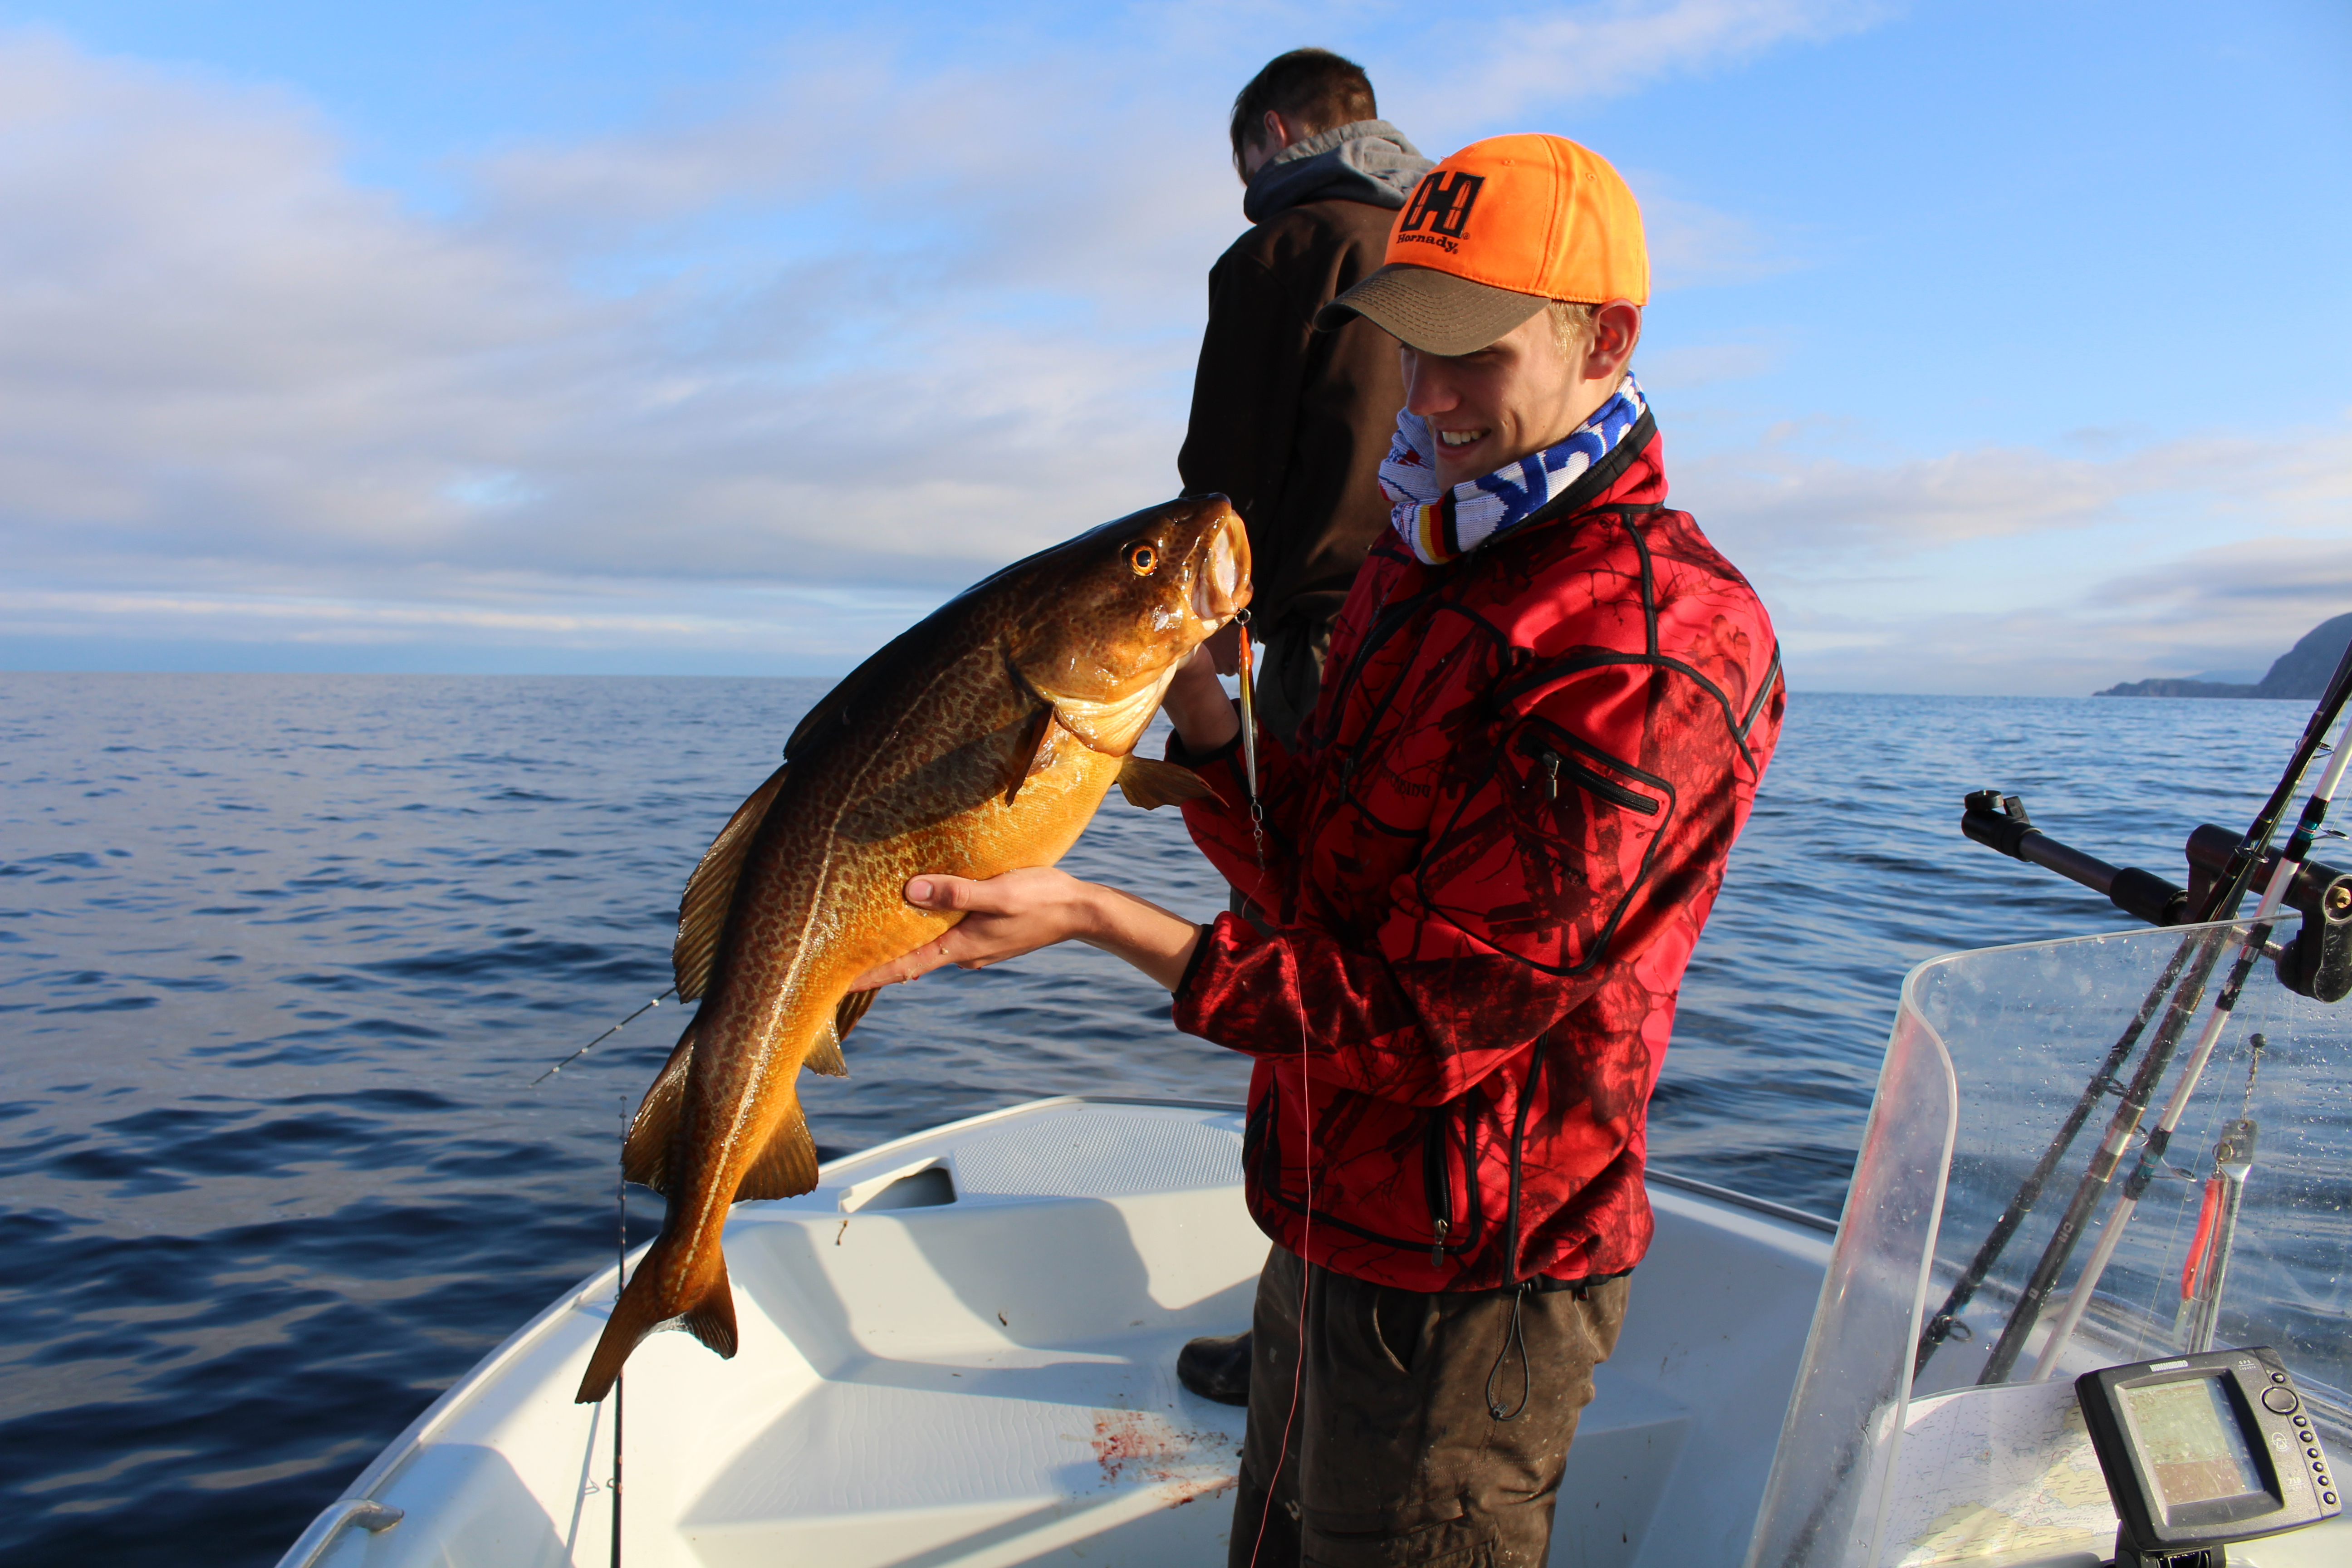 Gerold mit 4,5 Kilo Tangdorsch jaegermagazin Wilddiebe Angeln in Norwegen